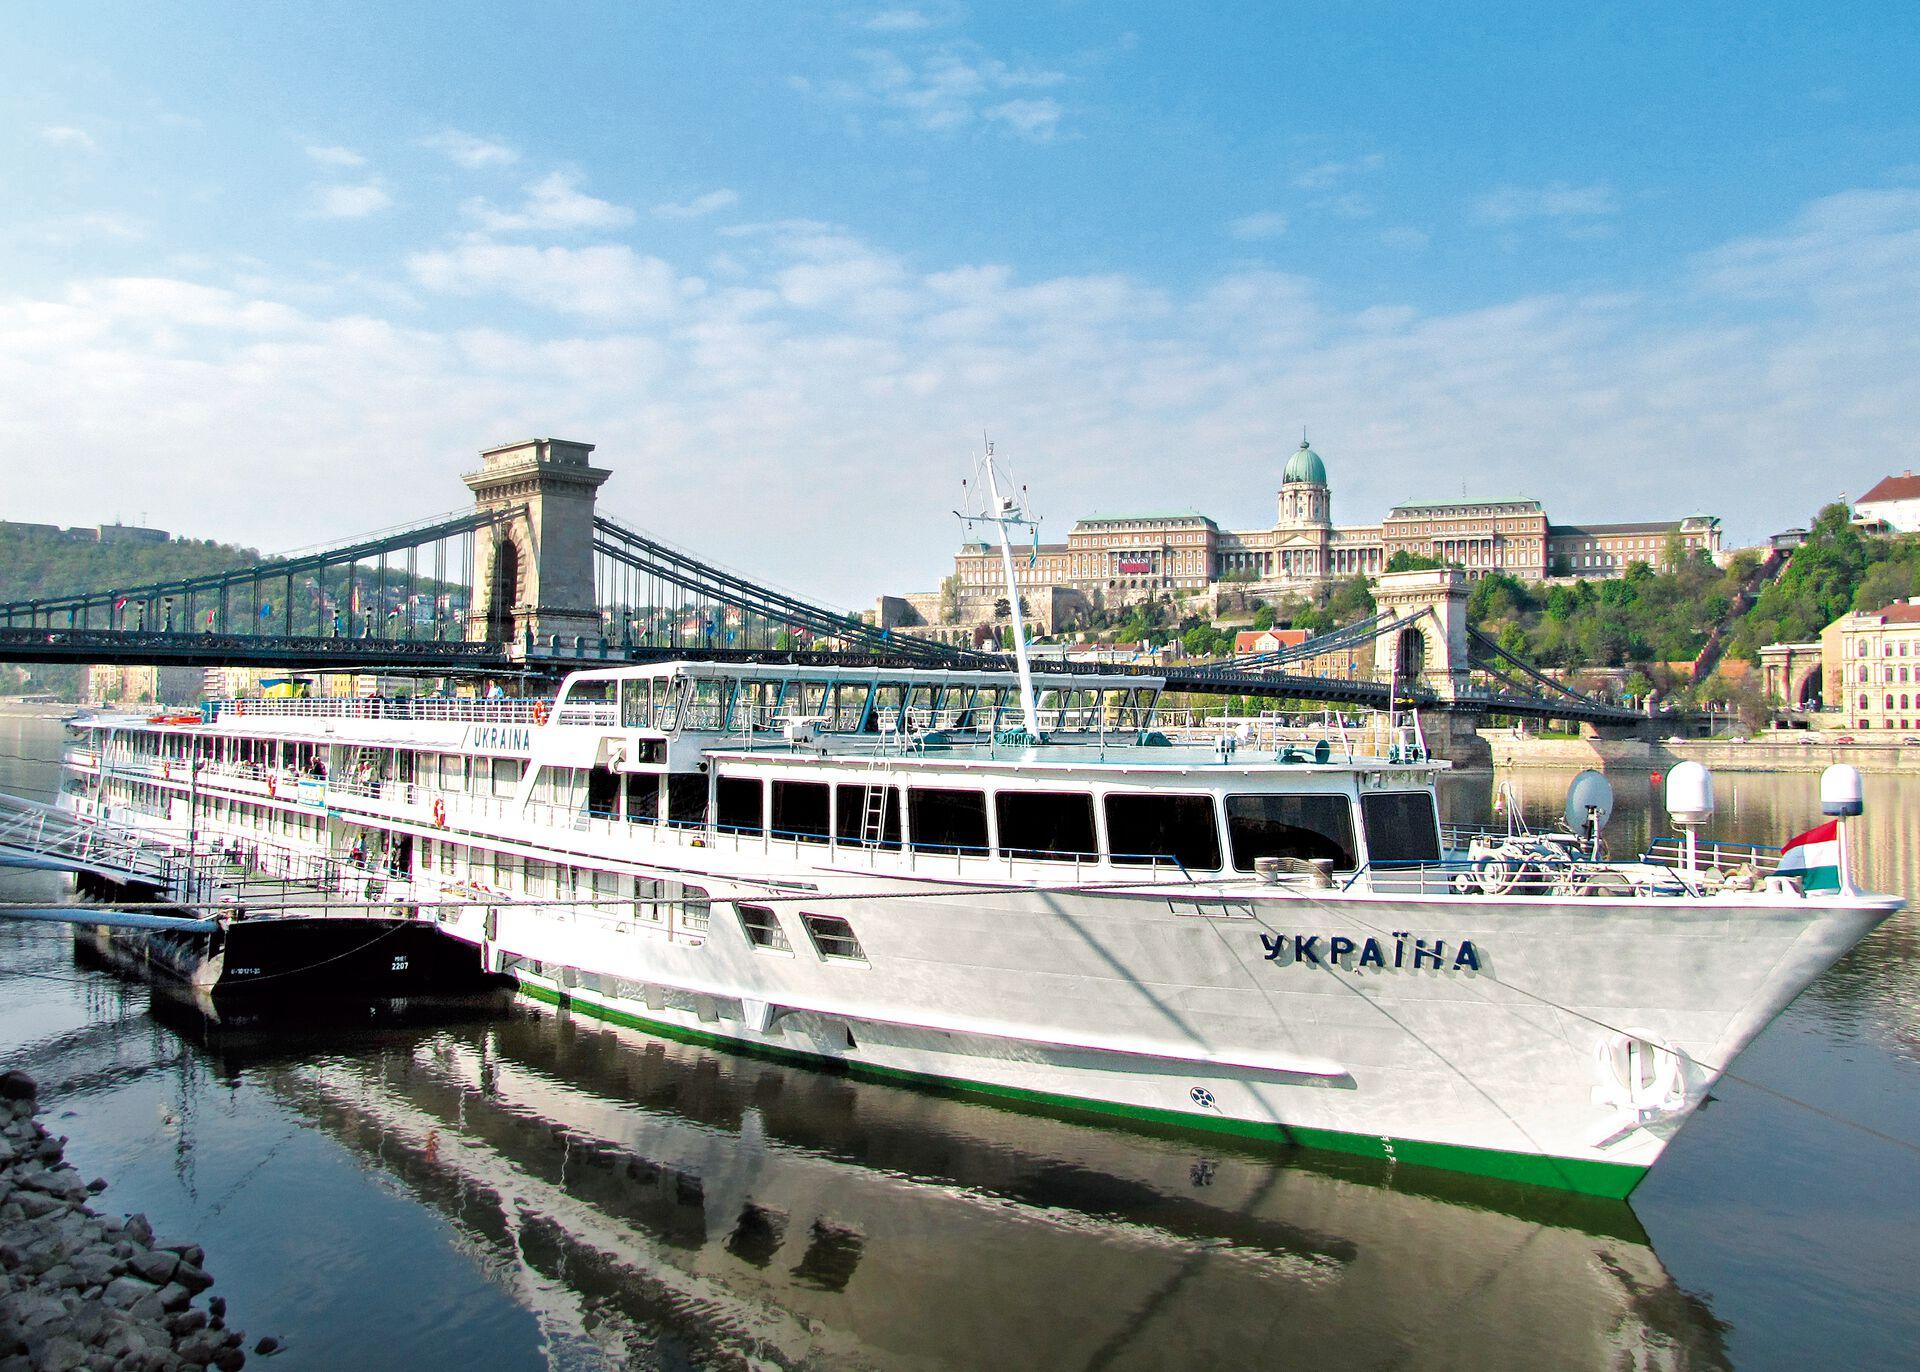 MS Ukraina - Donau Flusskreuzfahrt